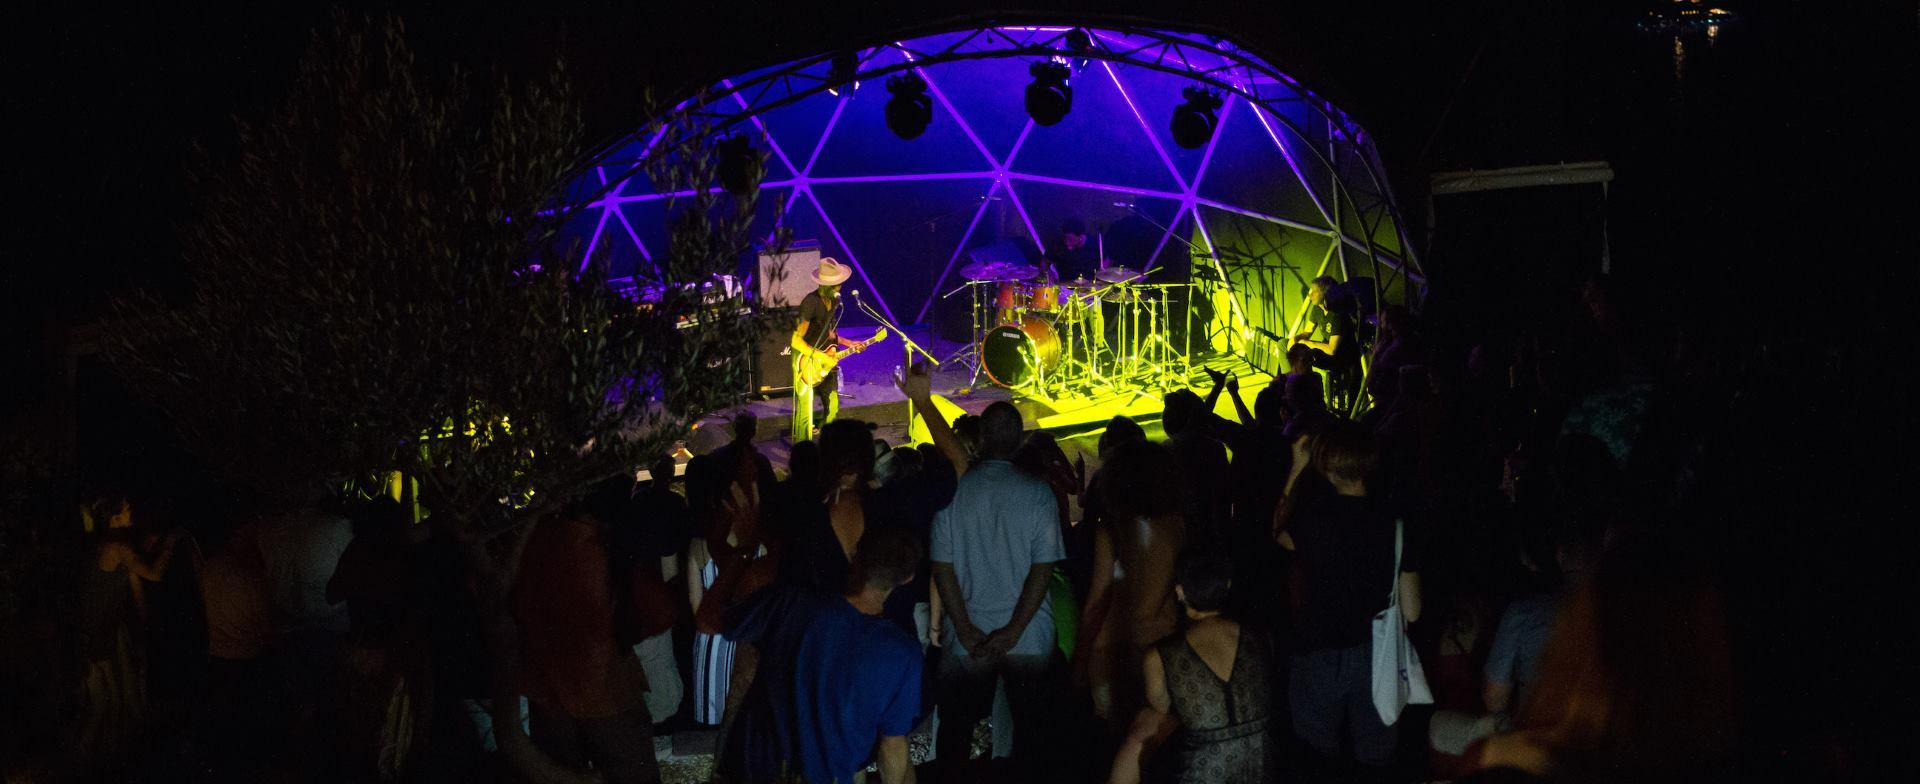 FESTIVAL ORSULA Keziah Jones rasplesao publiku svojim hitovima